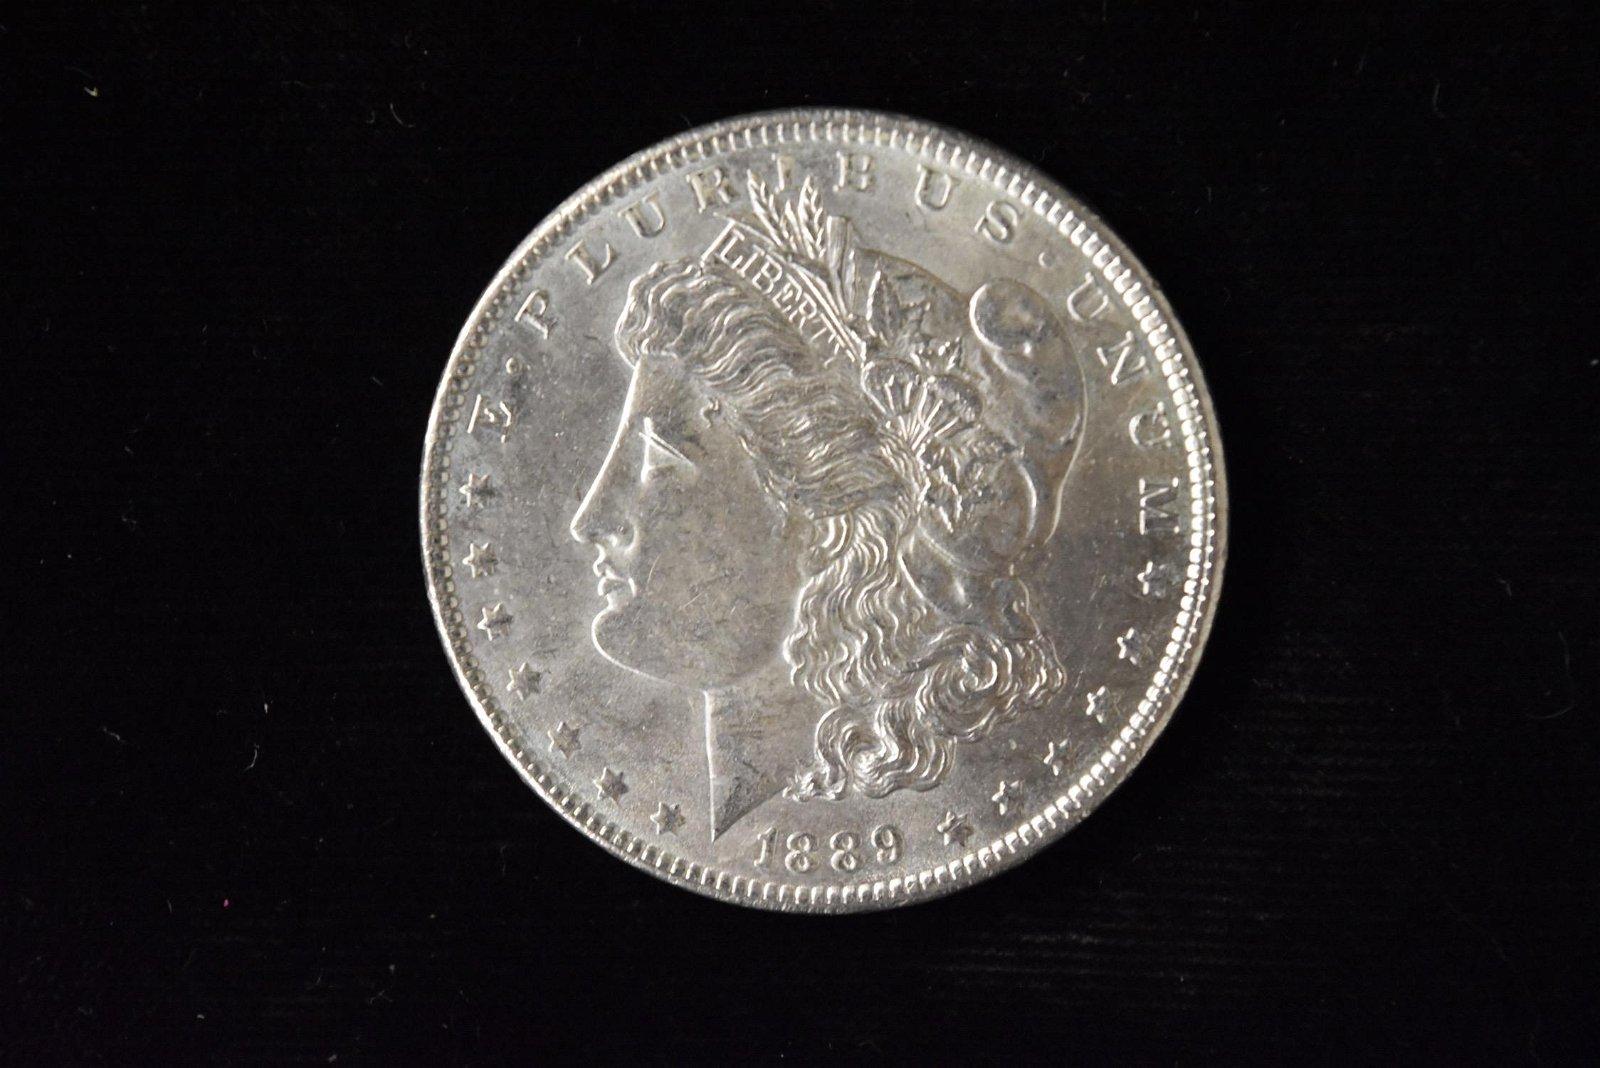 1889 High Grade Morgan Silver Dollar Grade By Picture.